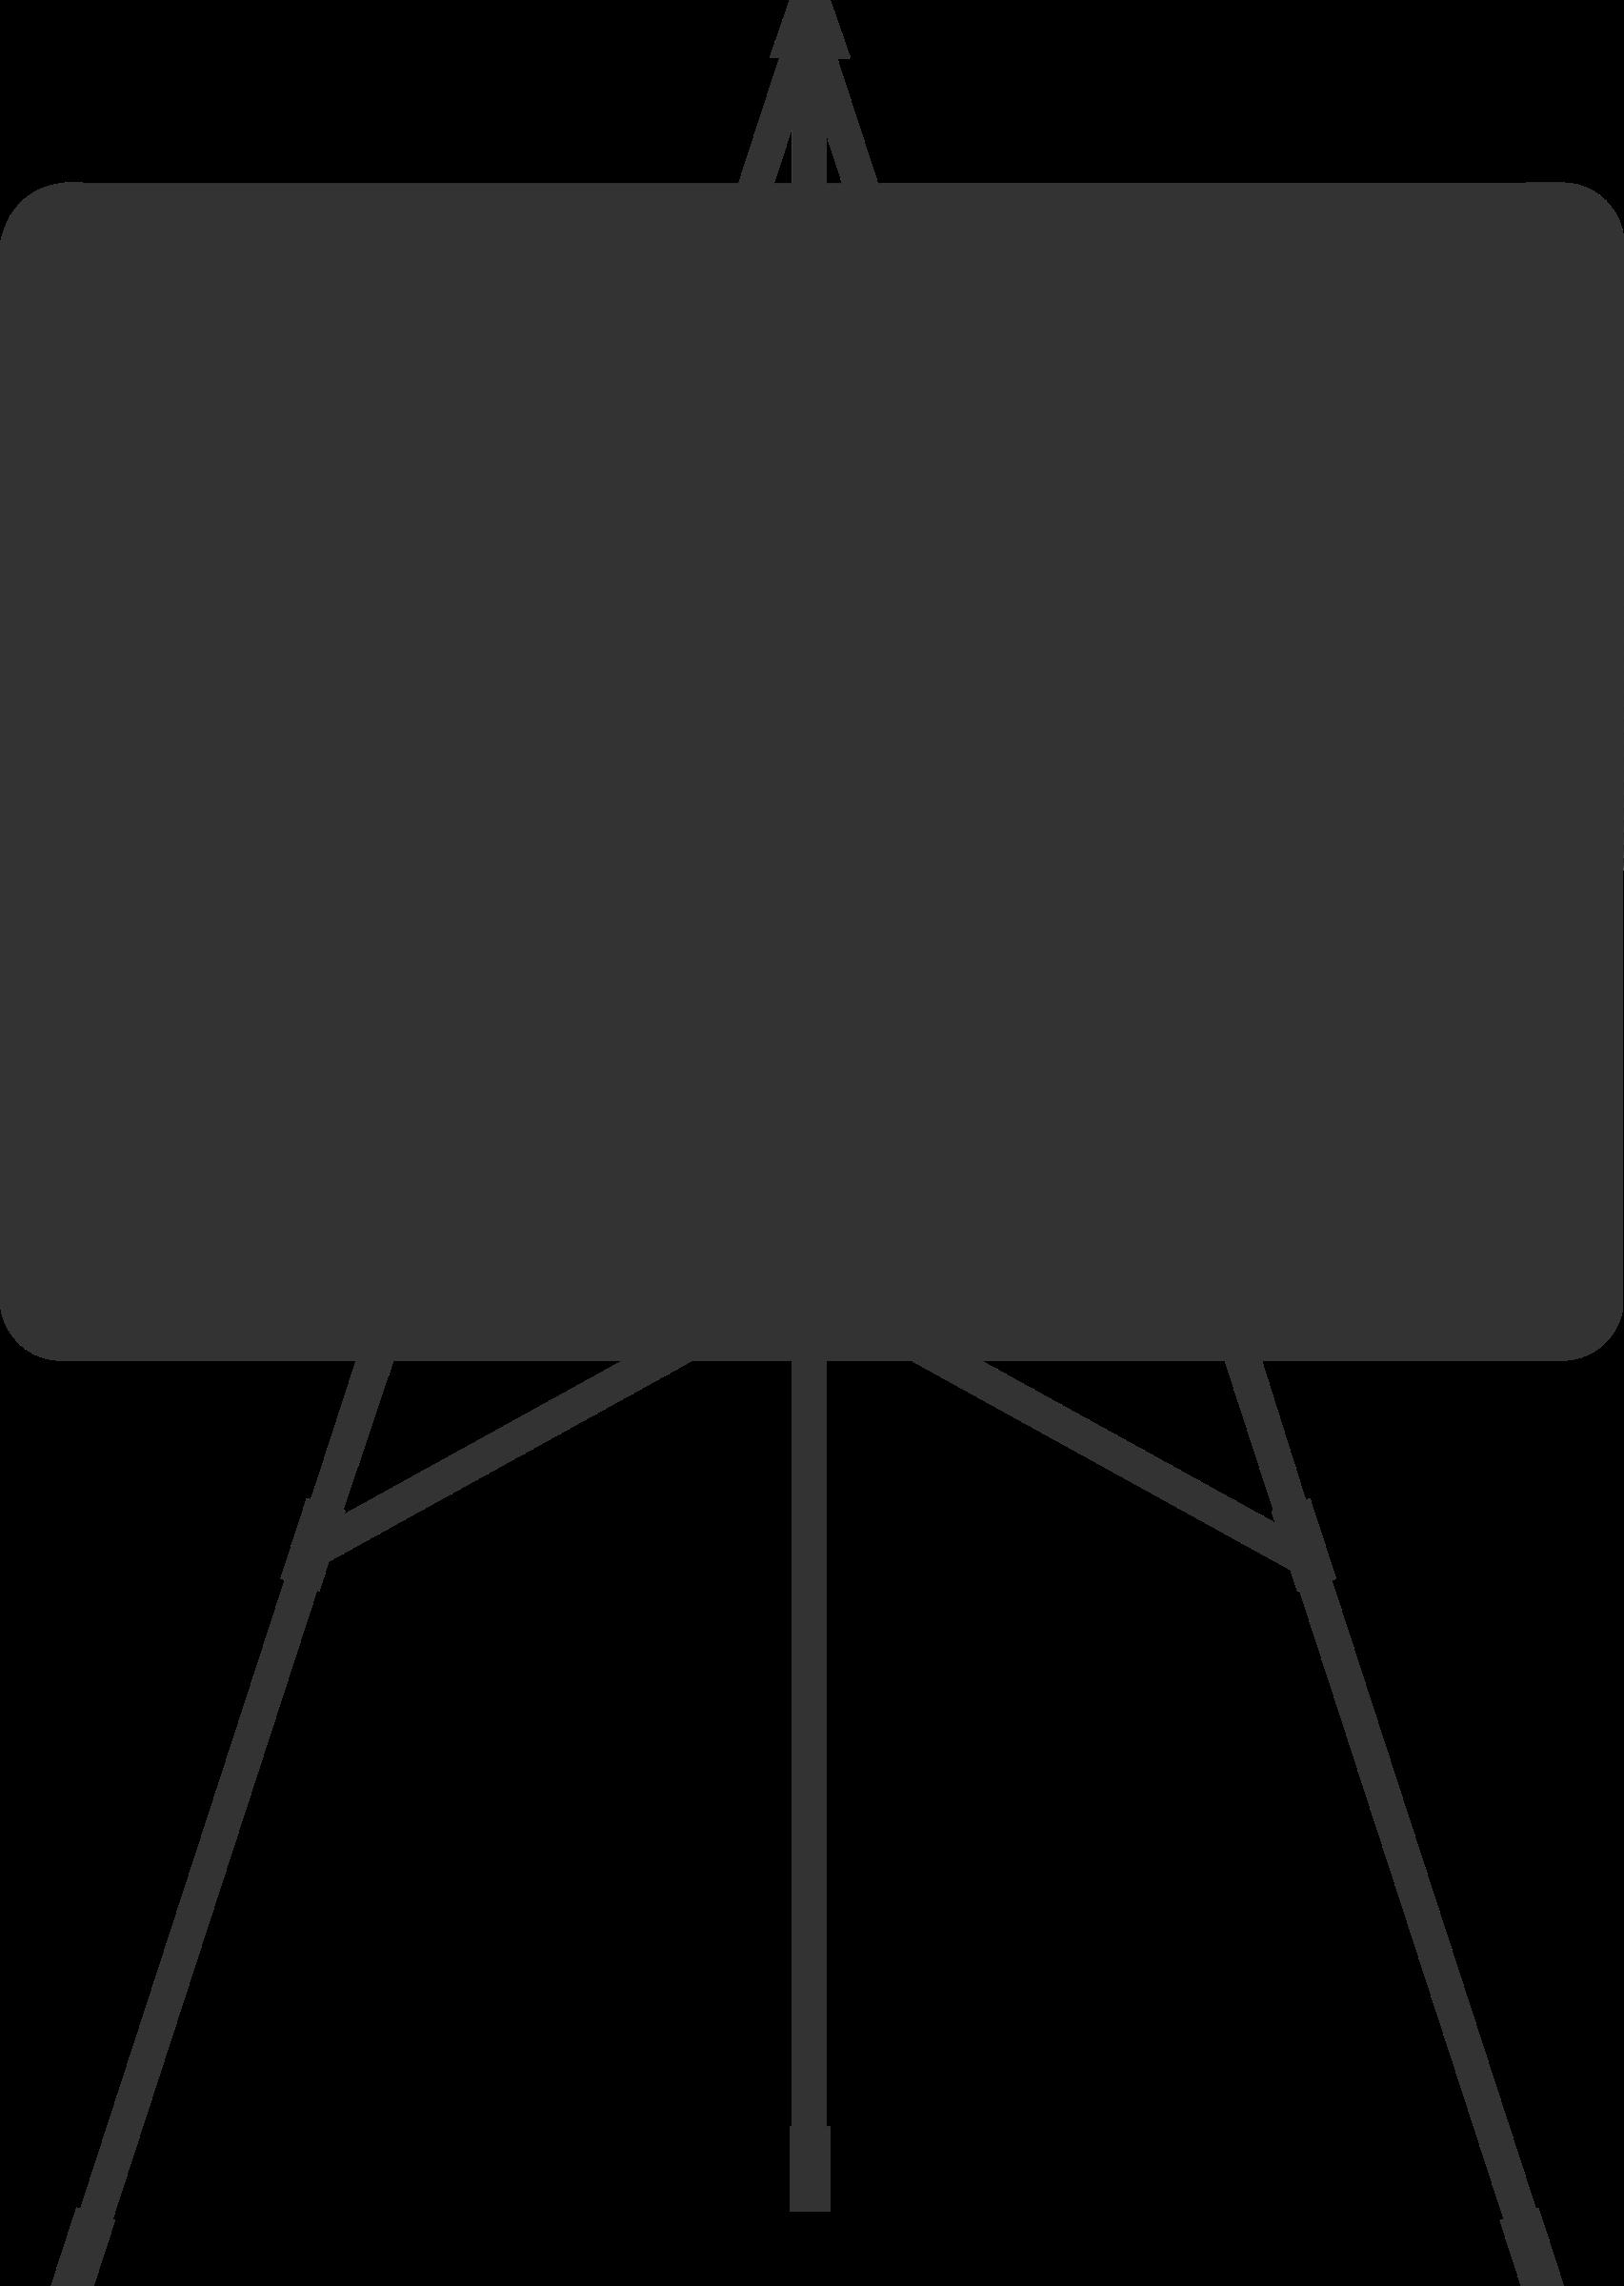 Drawing Board Download PNG Image SVG Clip arts